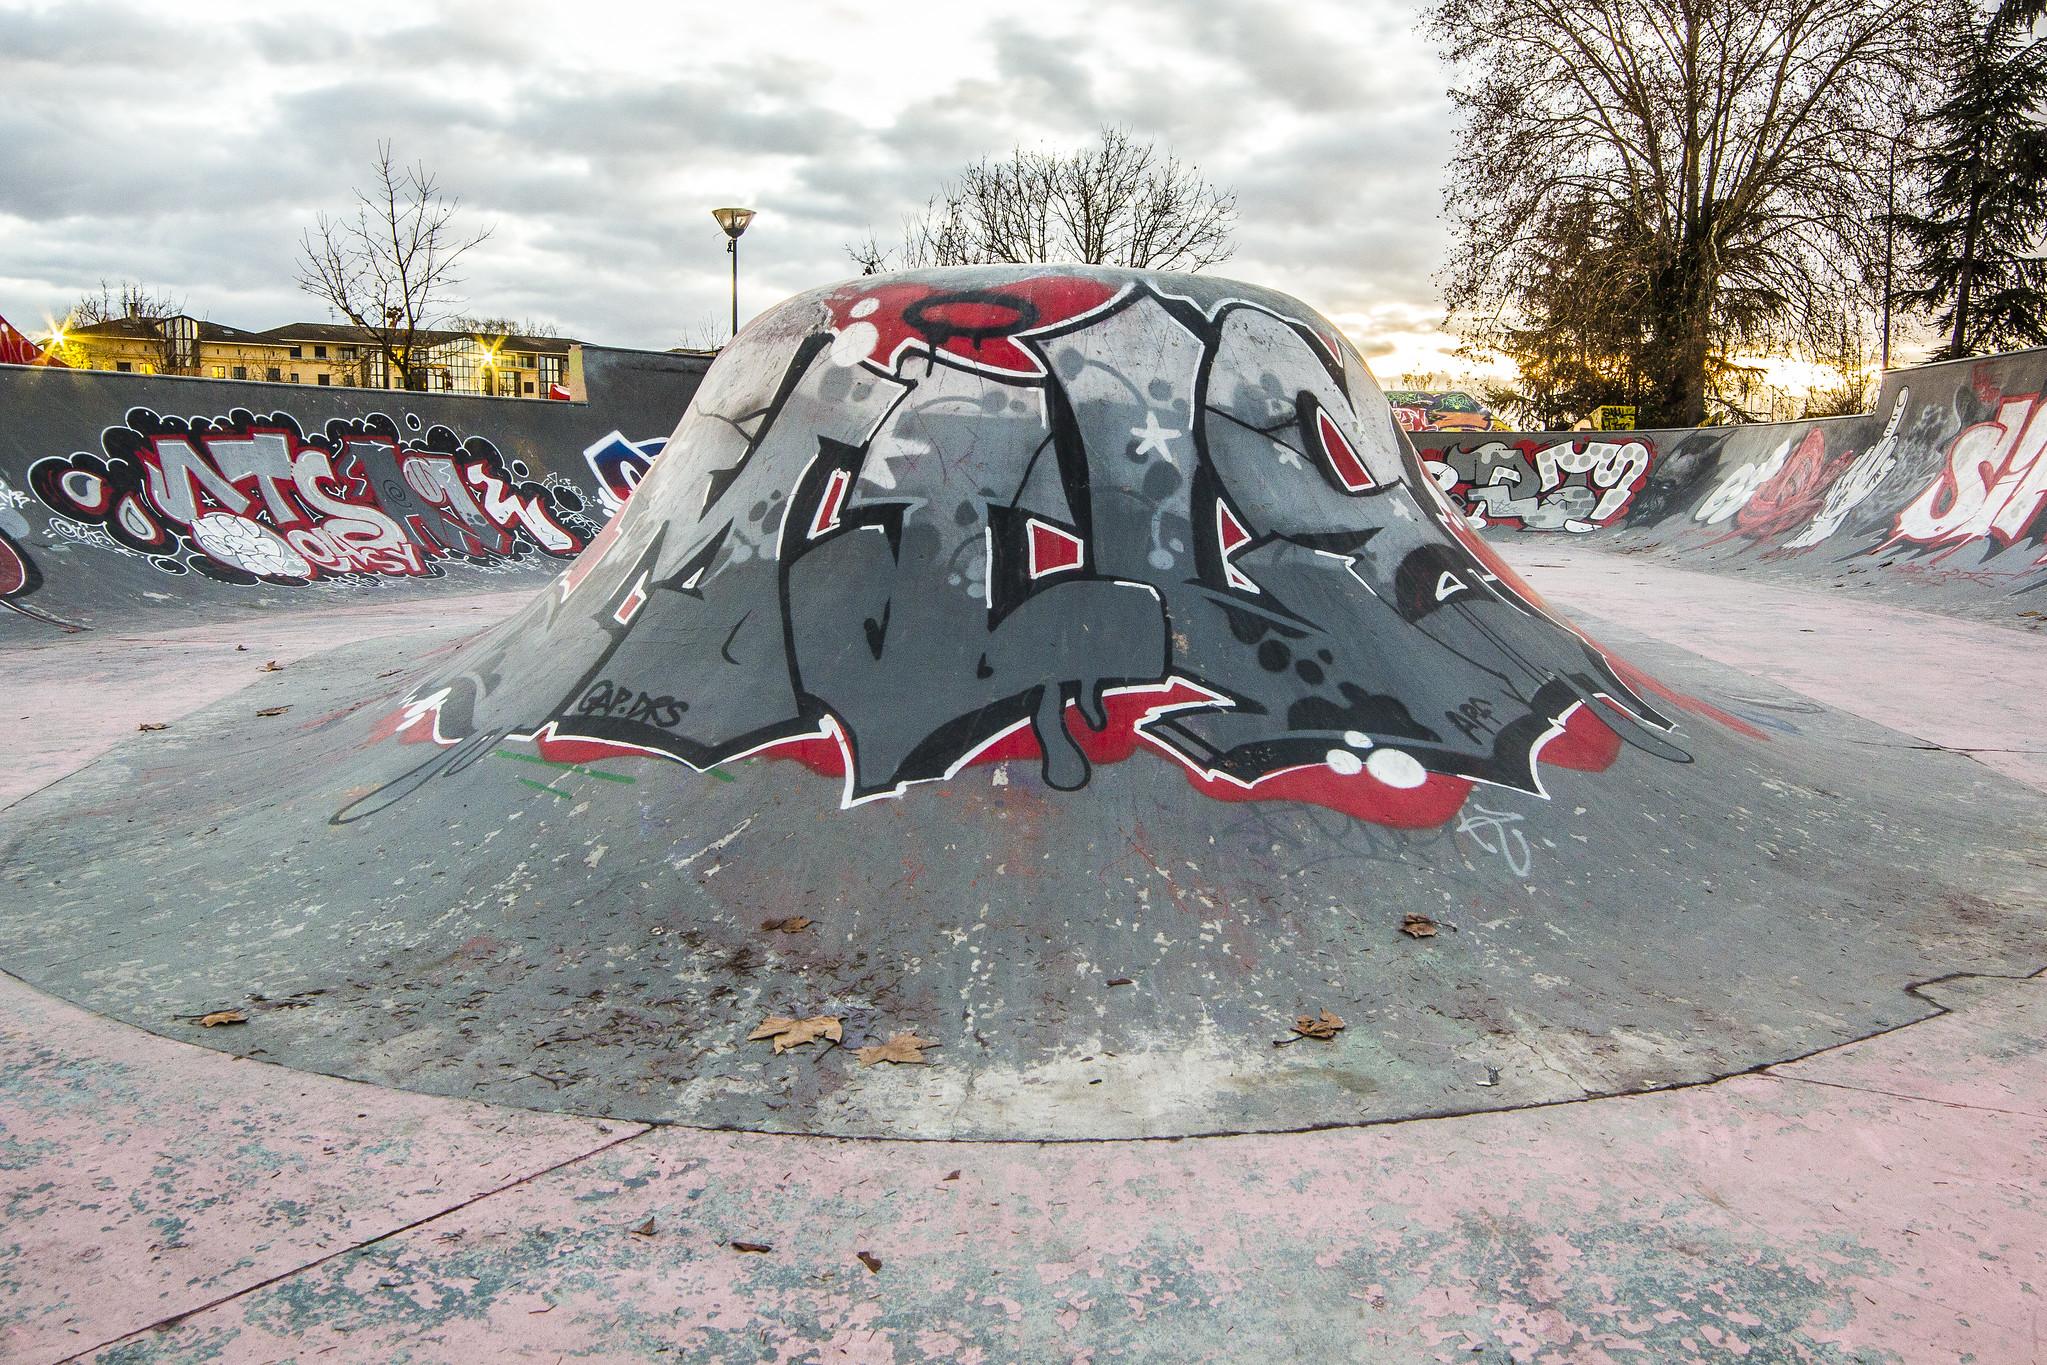 mile graffiti